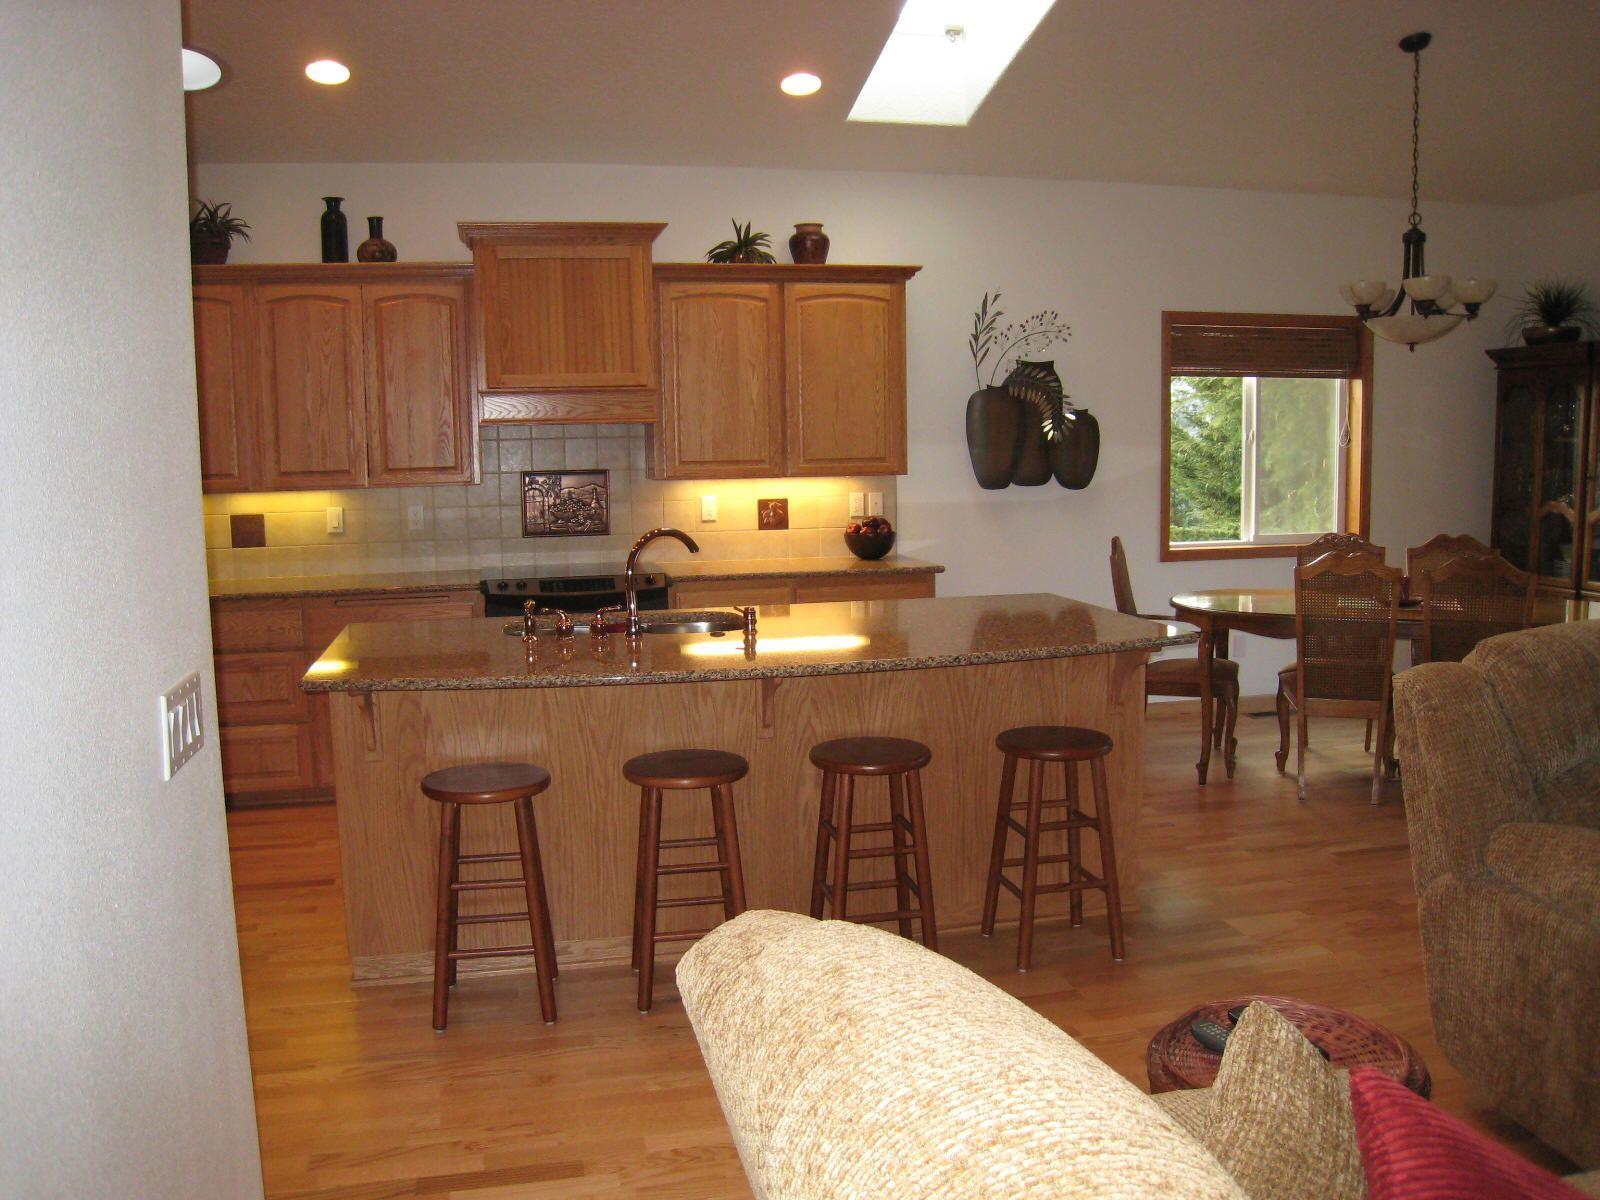 Wooden Kitchen Island Design Ideas For Small Space Kitchen With Impressive Kitchen With Islands Designs Design Inspiration